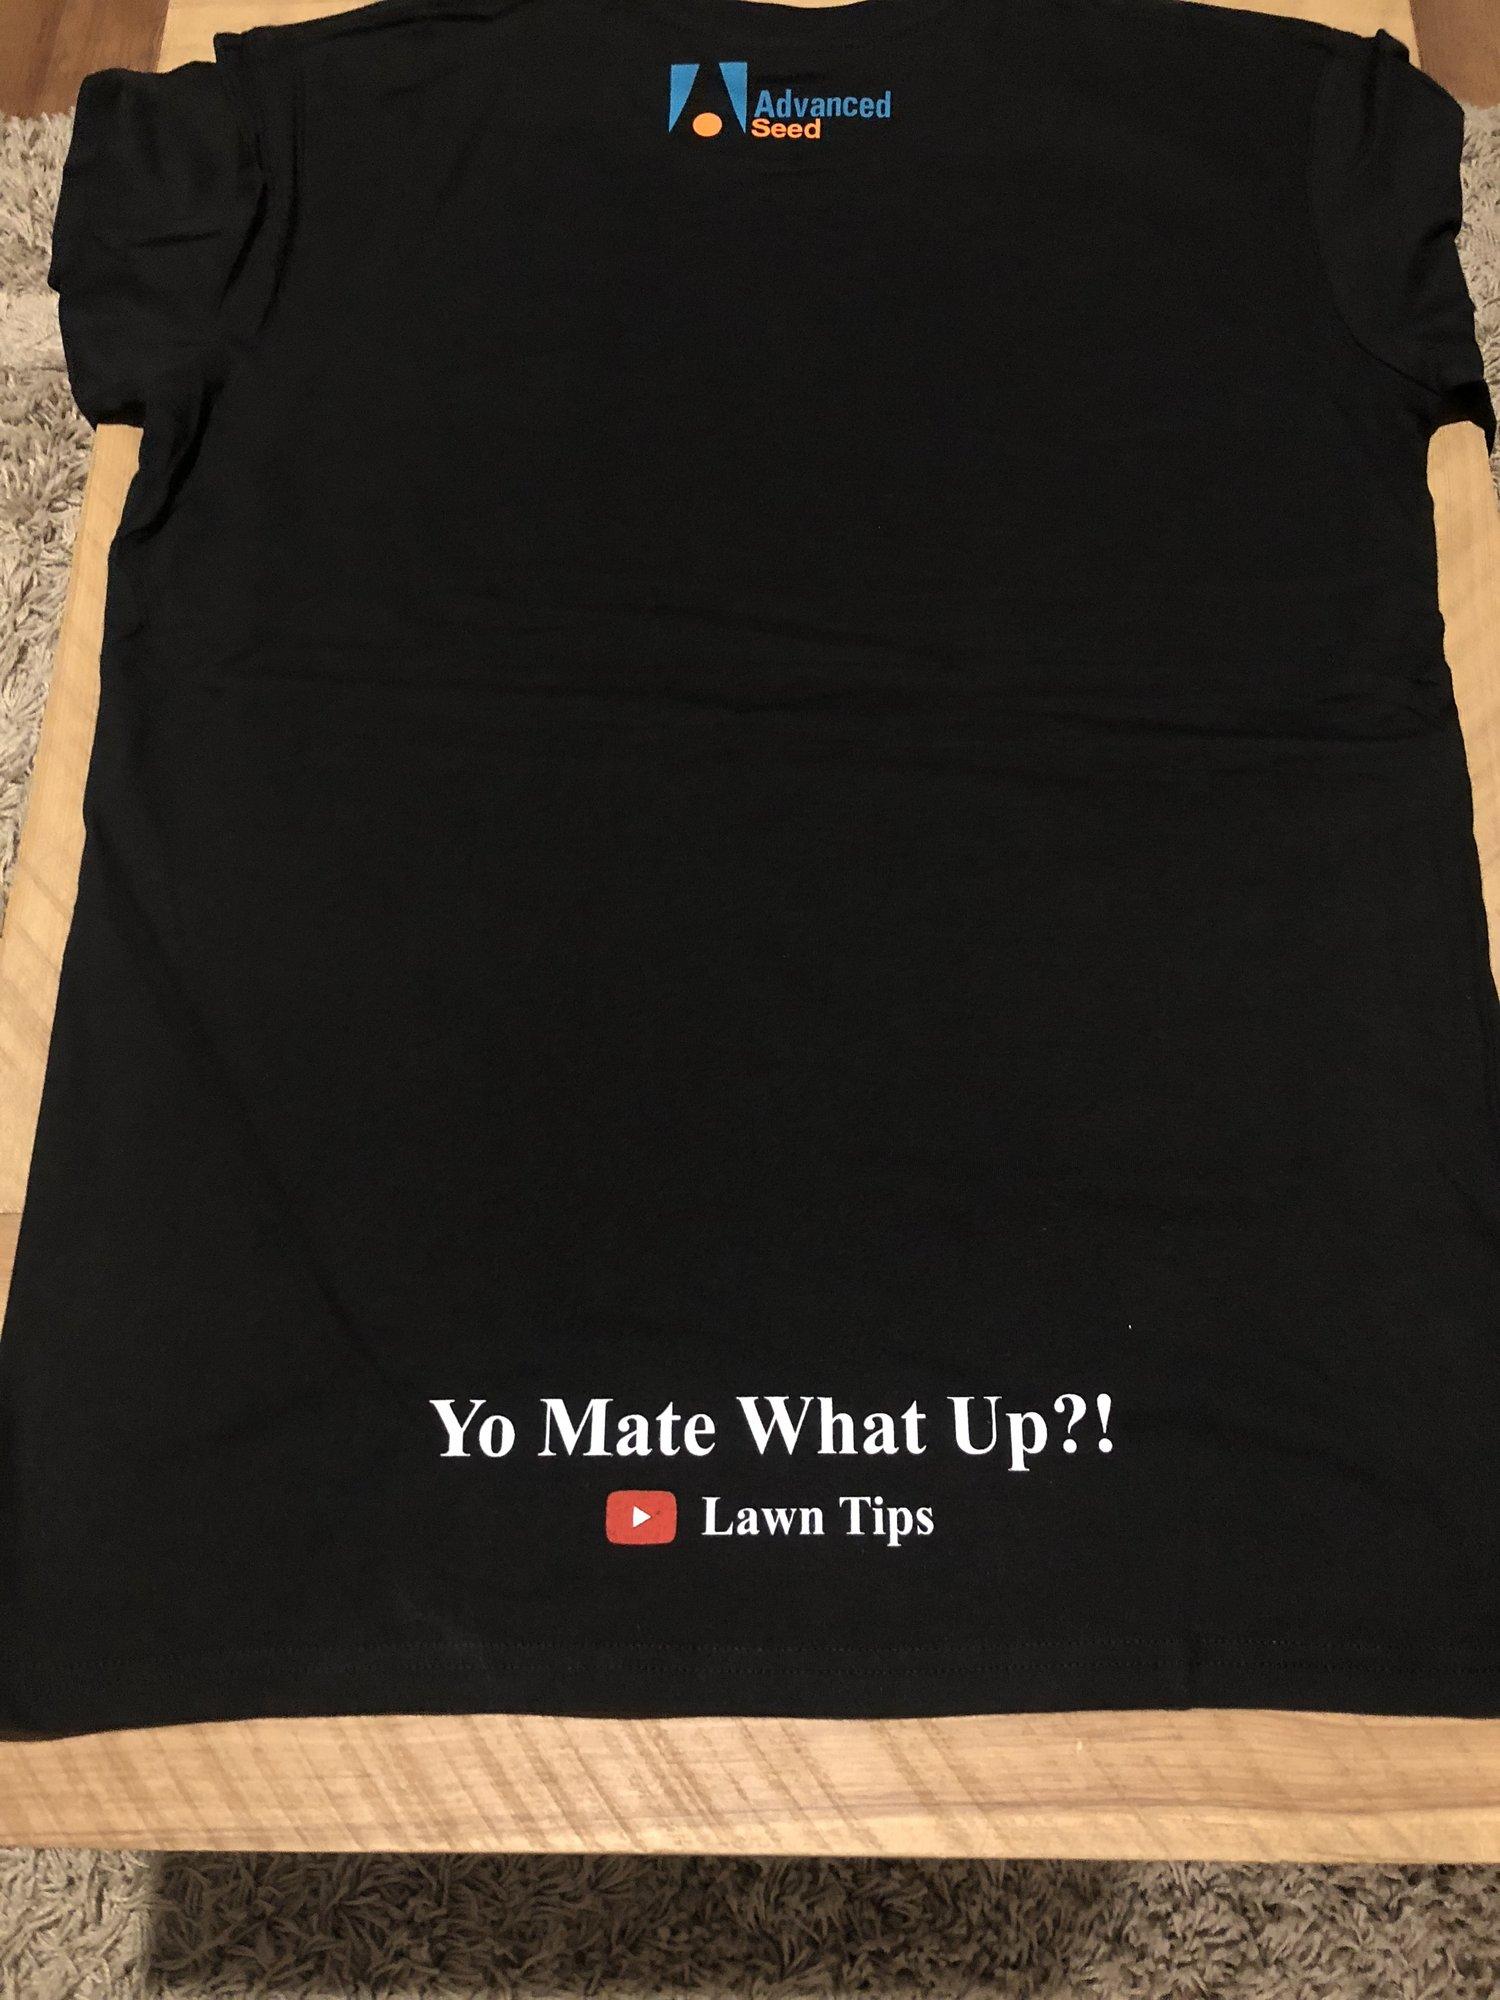 Lawn Tips Shirt